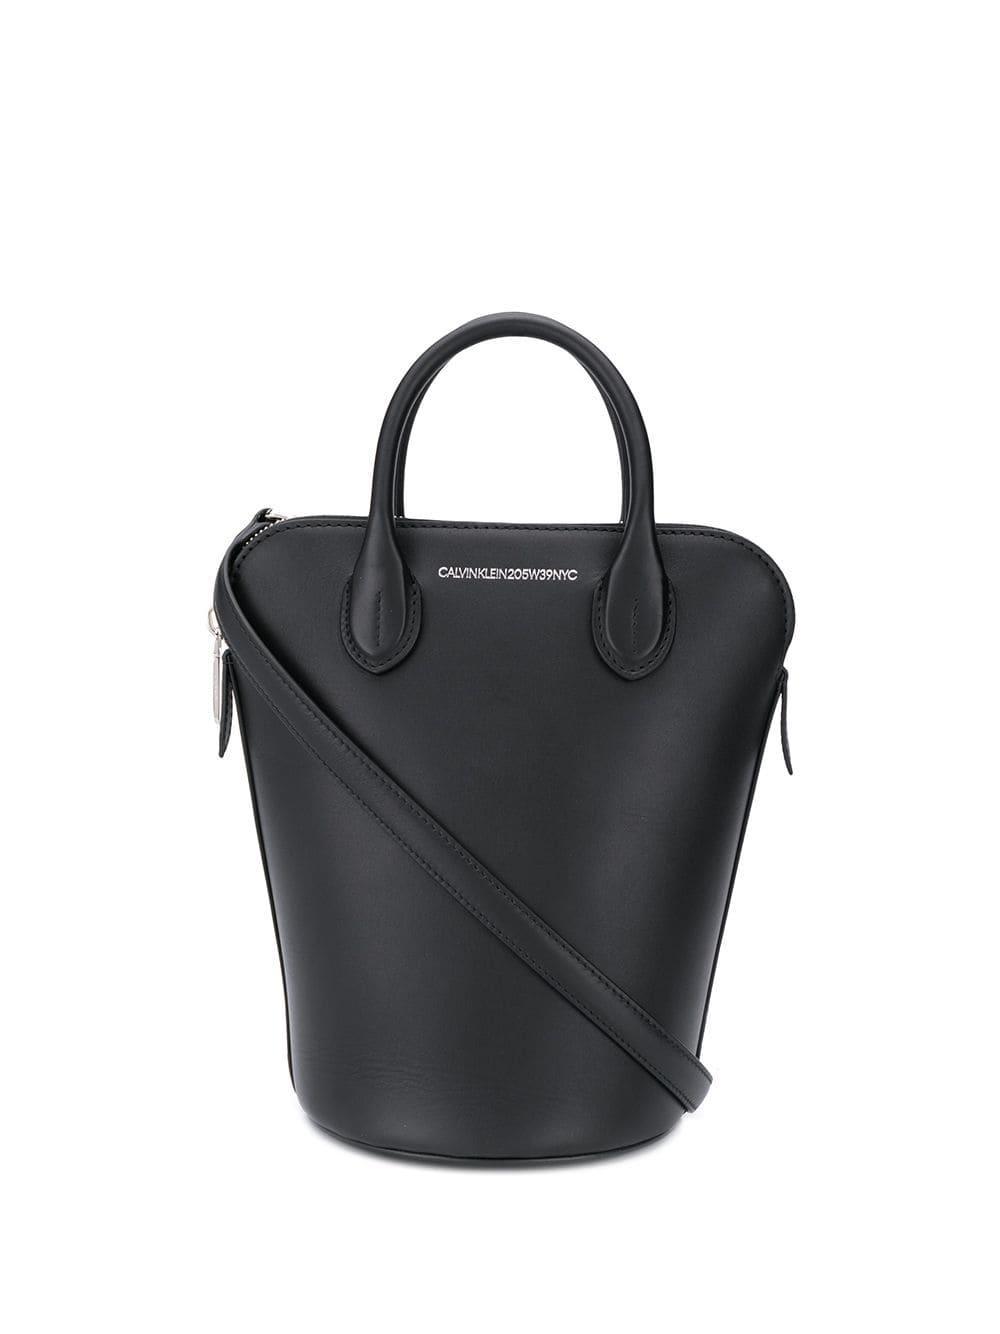 bd38ae2f55 CALVIN KLEIN 205W39NYC - Black Bucket Tote Bag - Lyst. View fullscreen